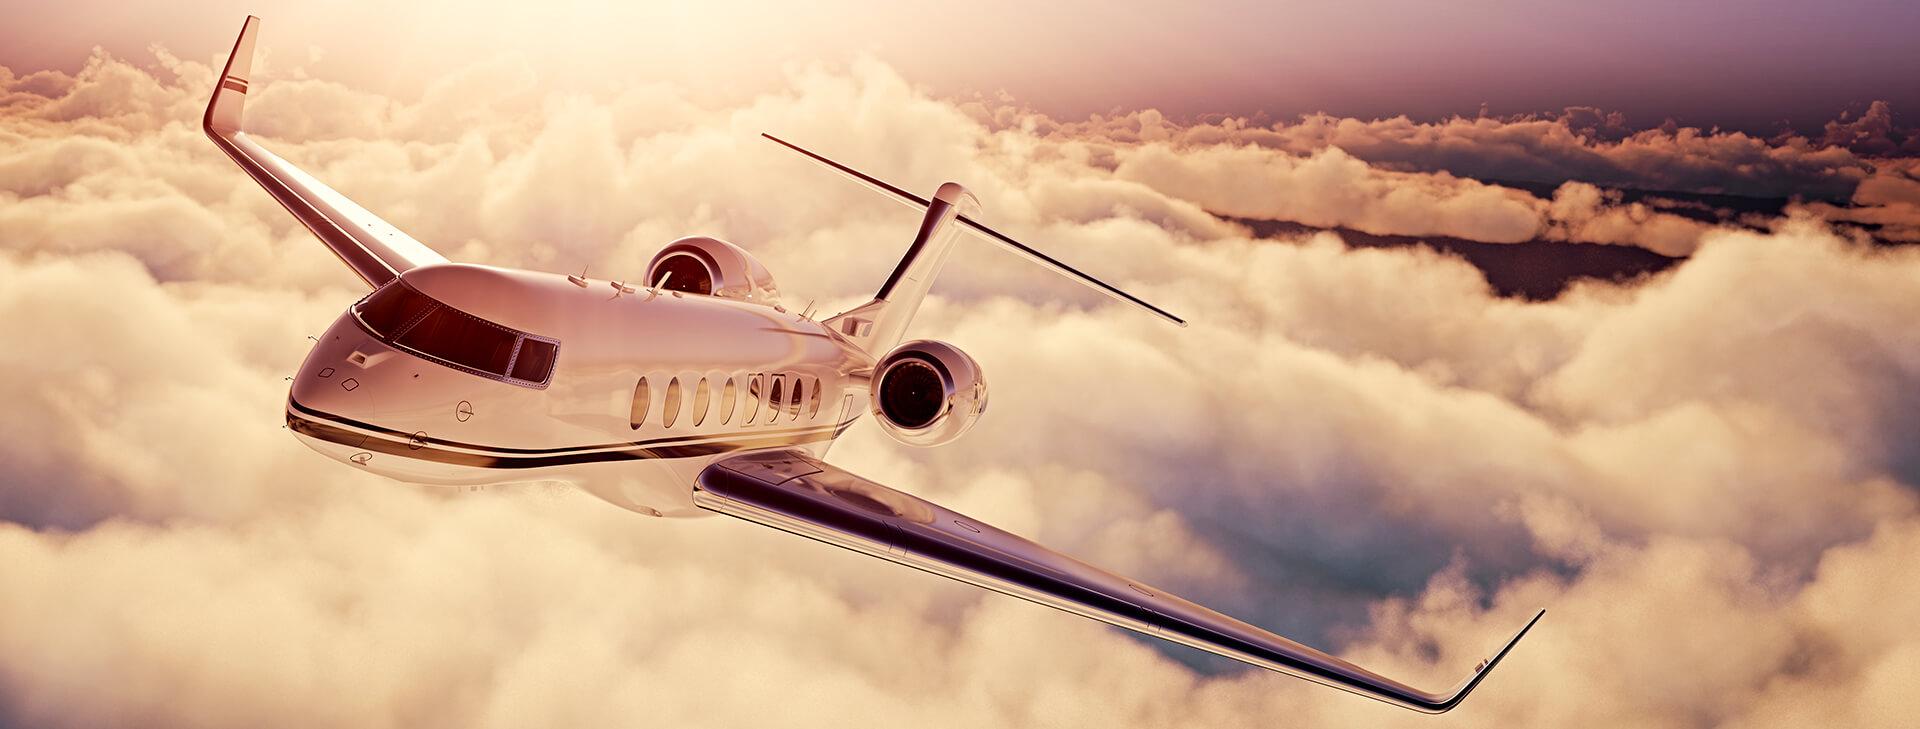 ZAHURA private air travel